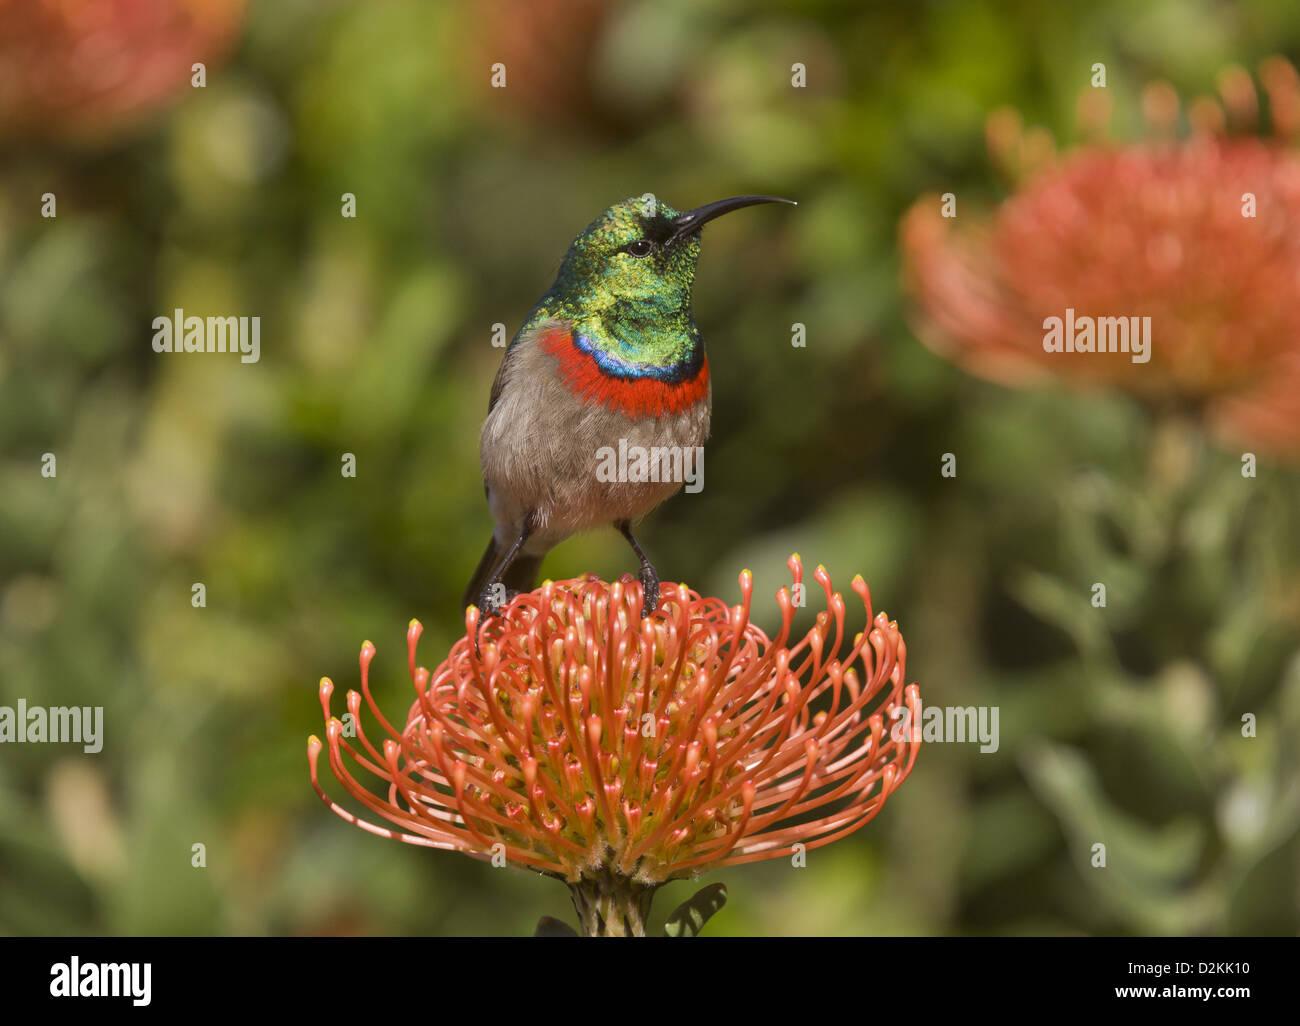 Lesser Double-collared Sunbird (Cinnyris chalybeus) feeding on Proteas (Leucospermum cordifolium) Cape, South Africa - Stock Image